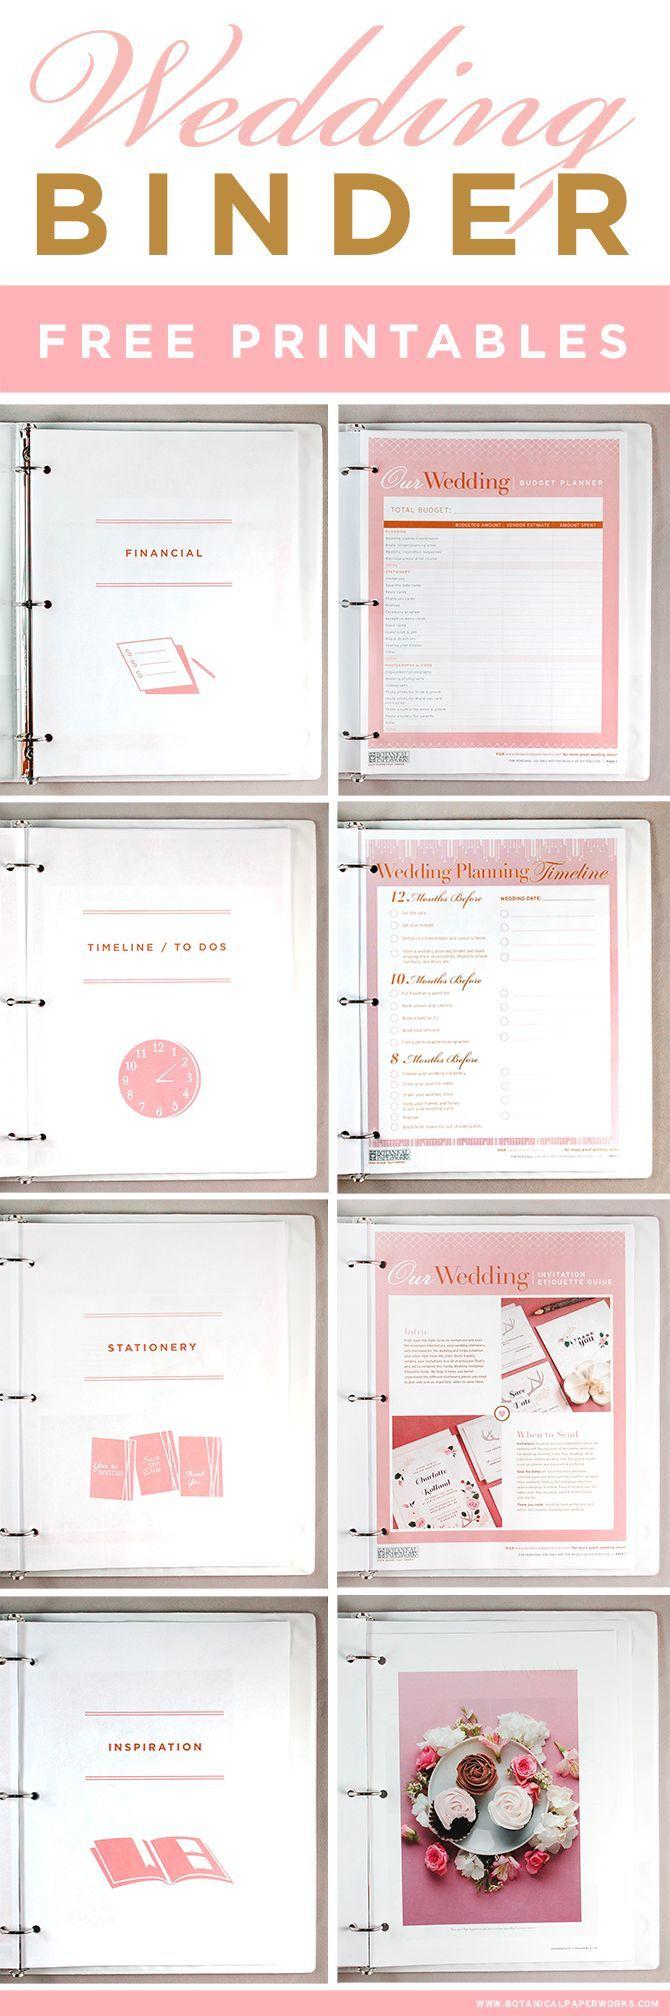 Free Printables} Wedding Planning Binder | Wedding Reception - Free Printable Wedding Planner